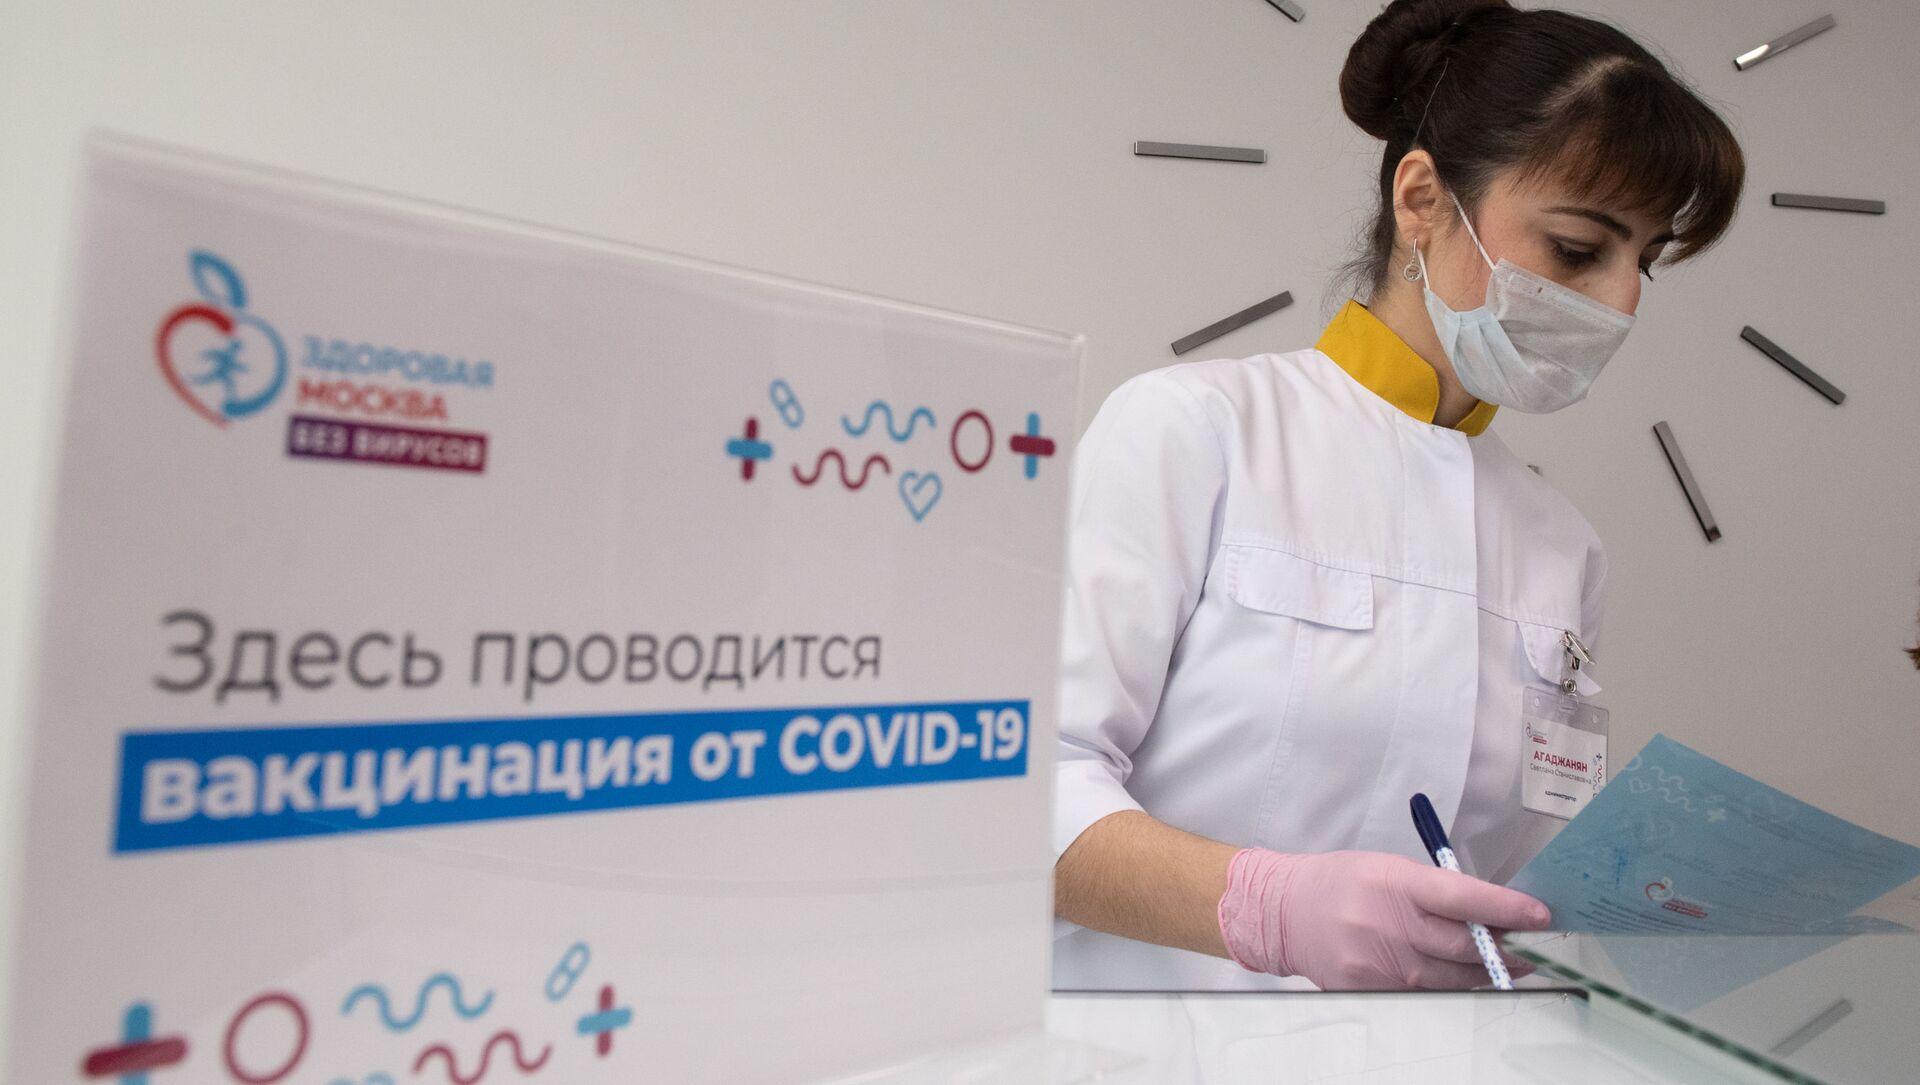 Медицинска сестра на пункту за вакцинацију против ковида у Москви - Sputnik Србија, 1920, 09.03.2021